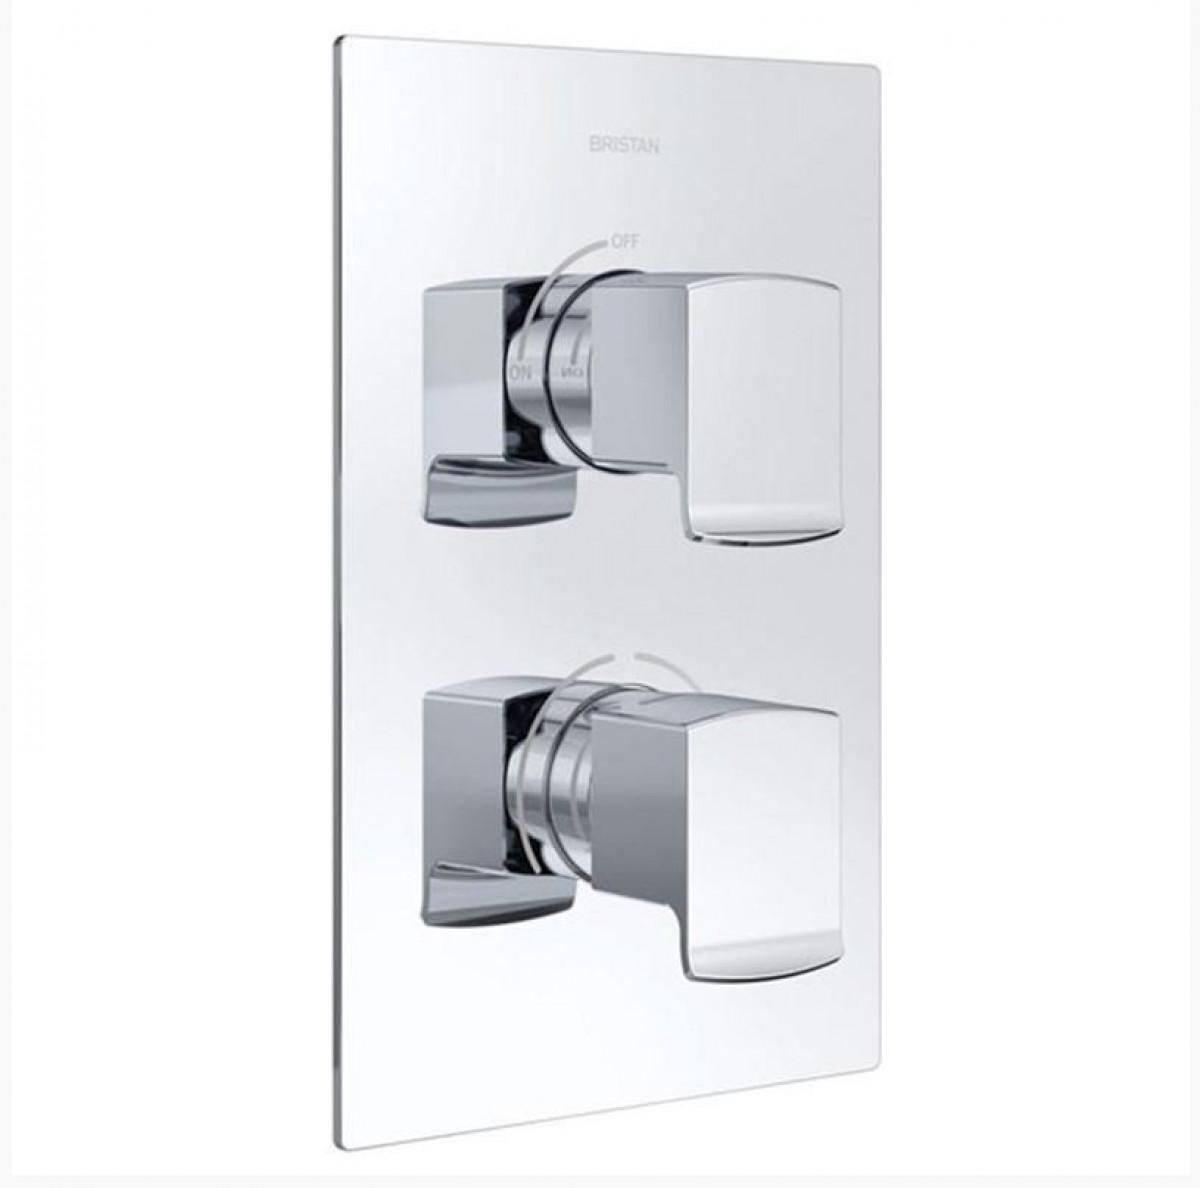 Bristan recessed shower shingles square feet per bundle